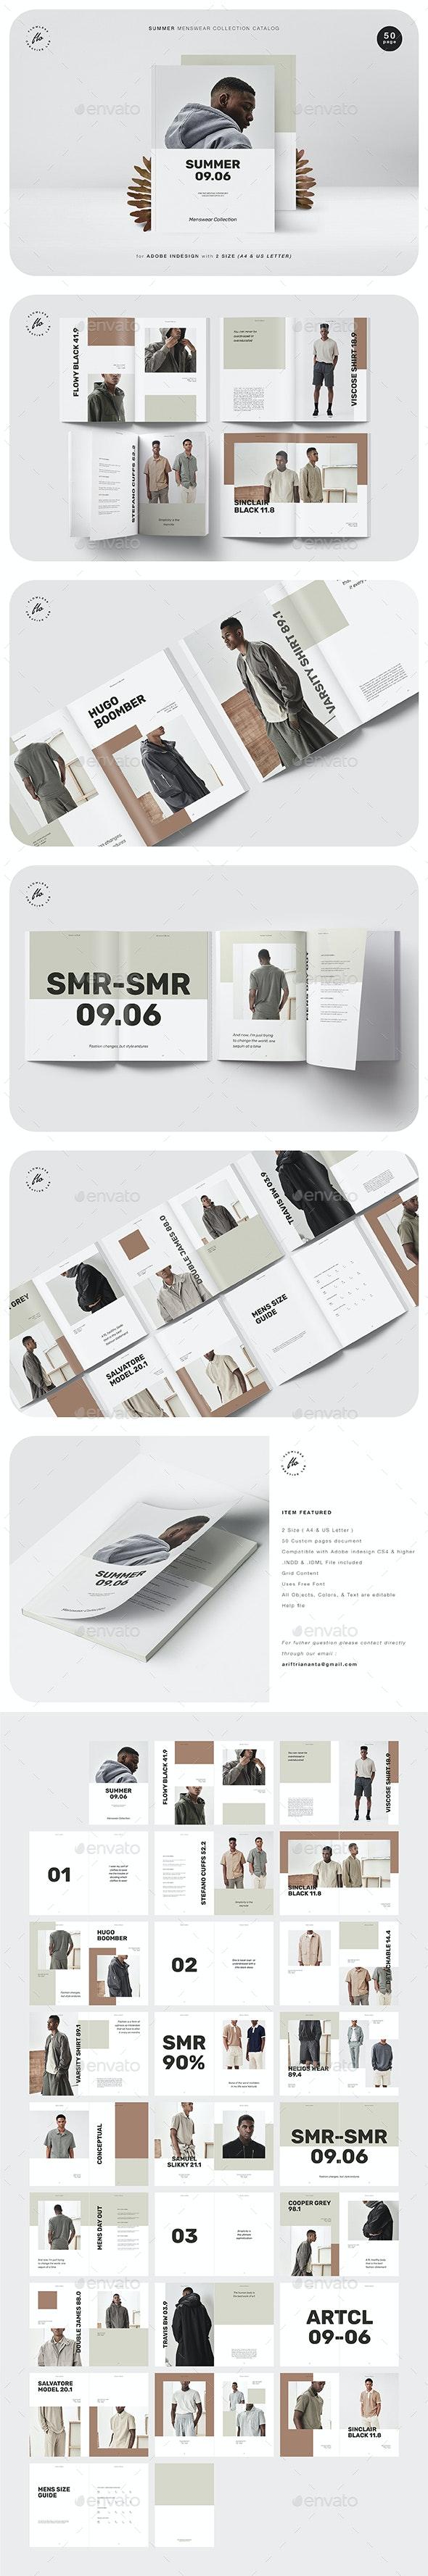 Summer Menswear Collection Catalog - Magazines Print Templates